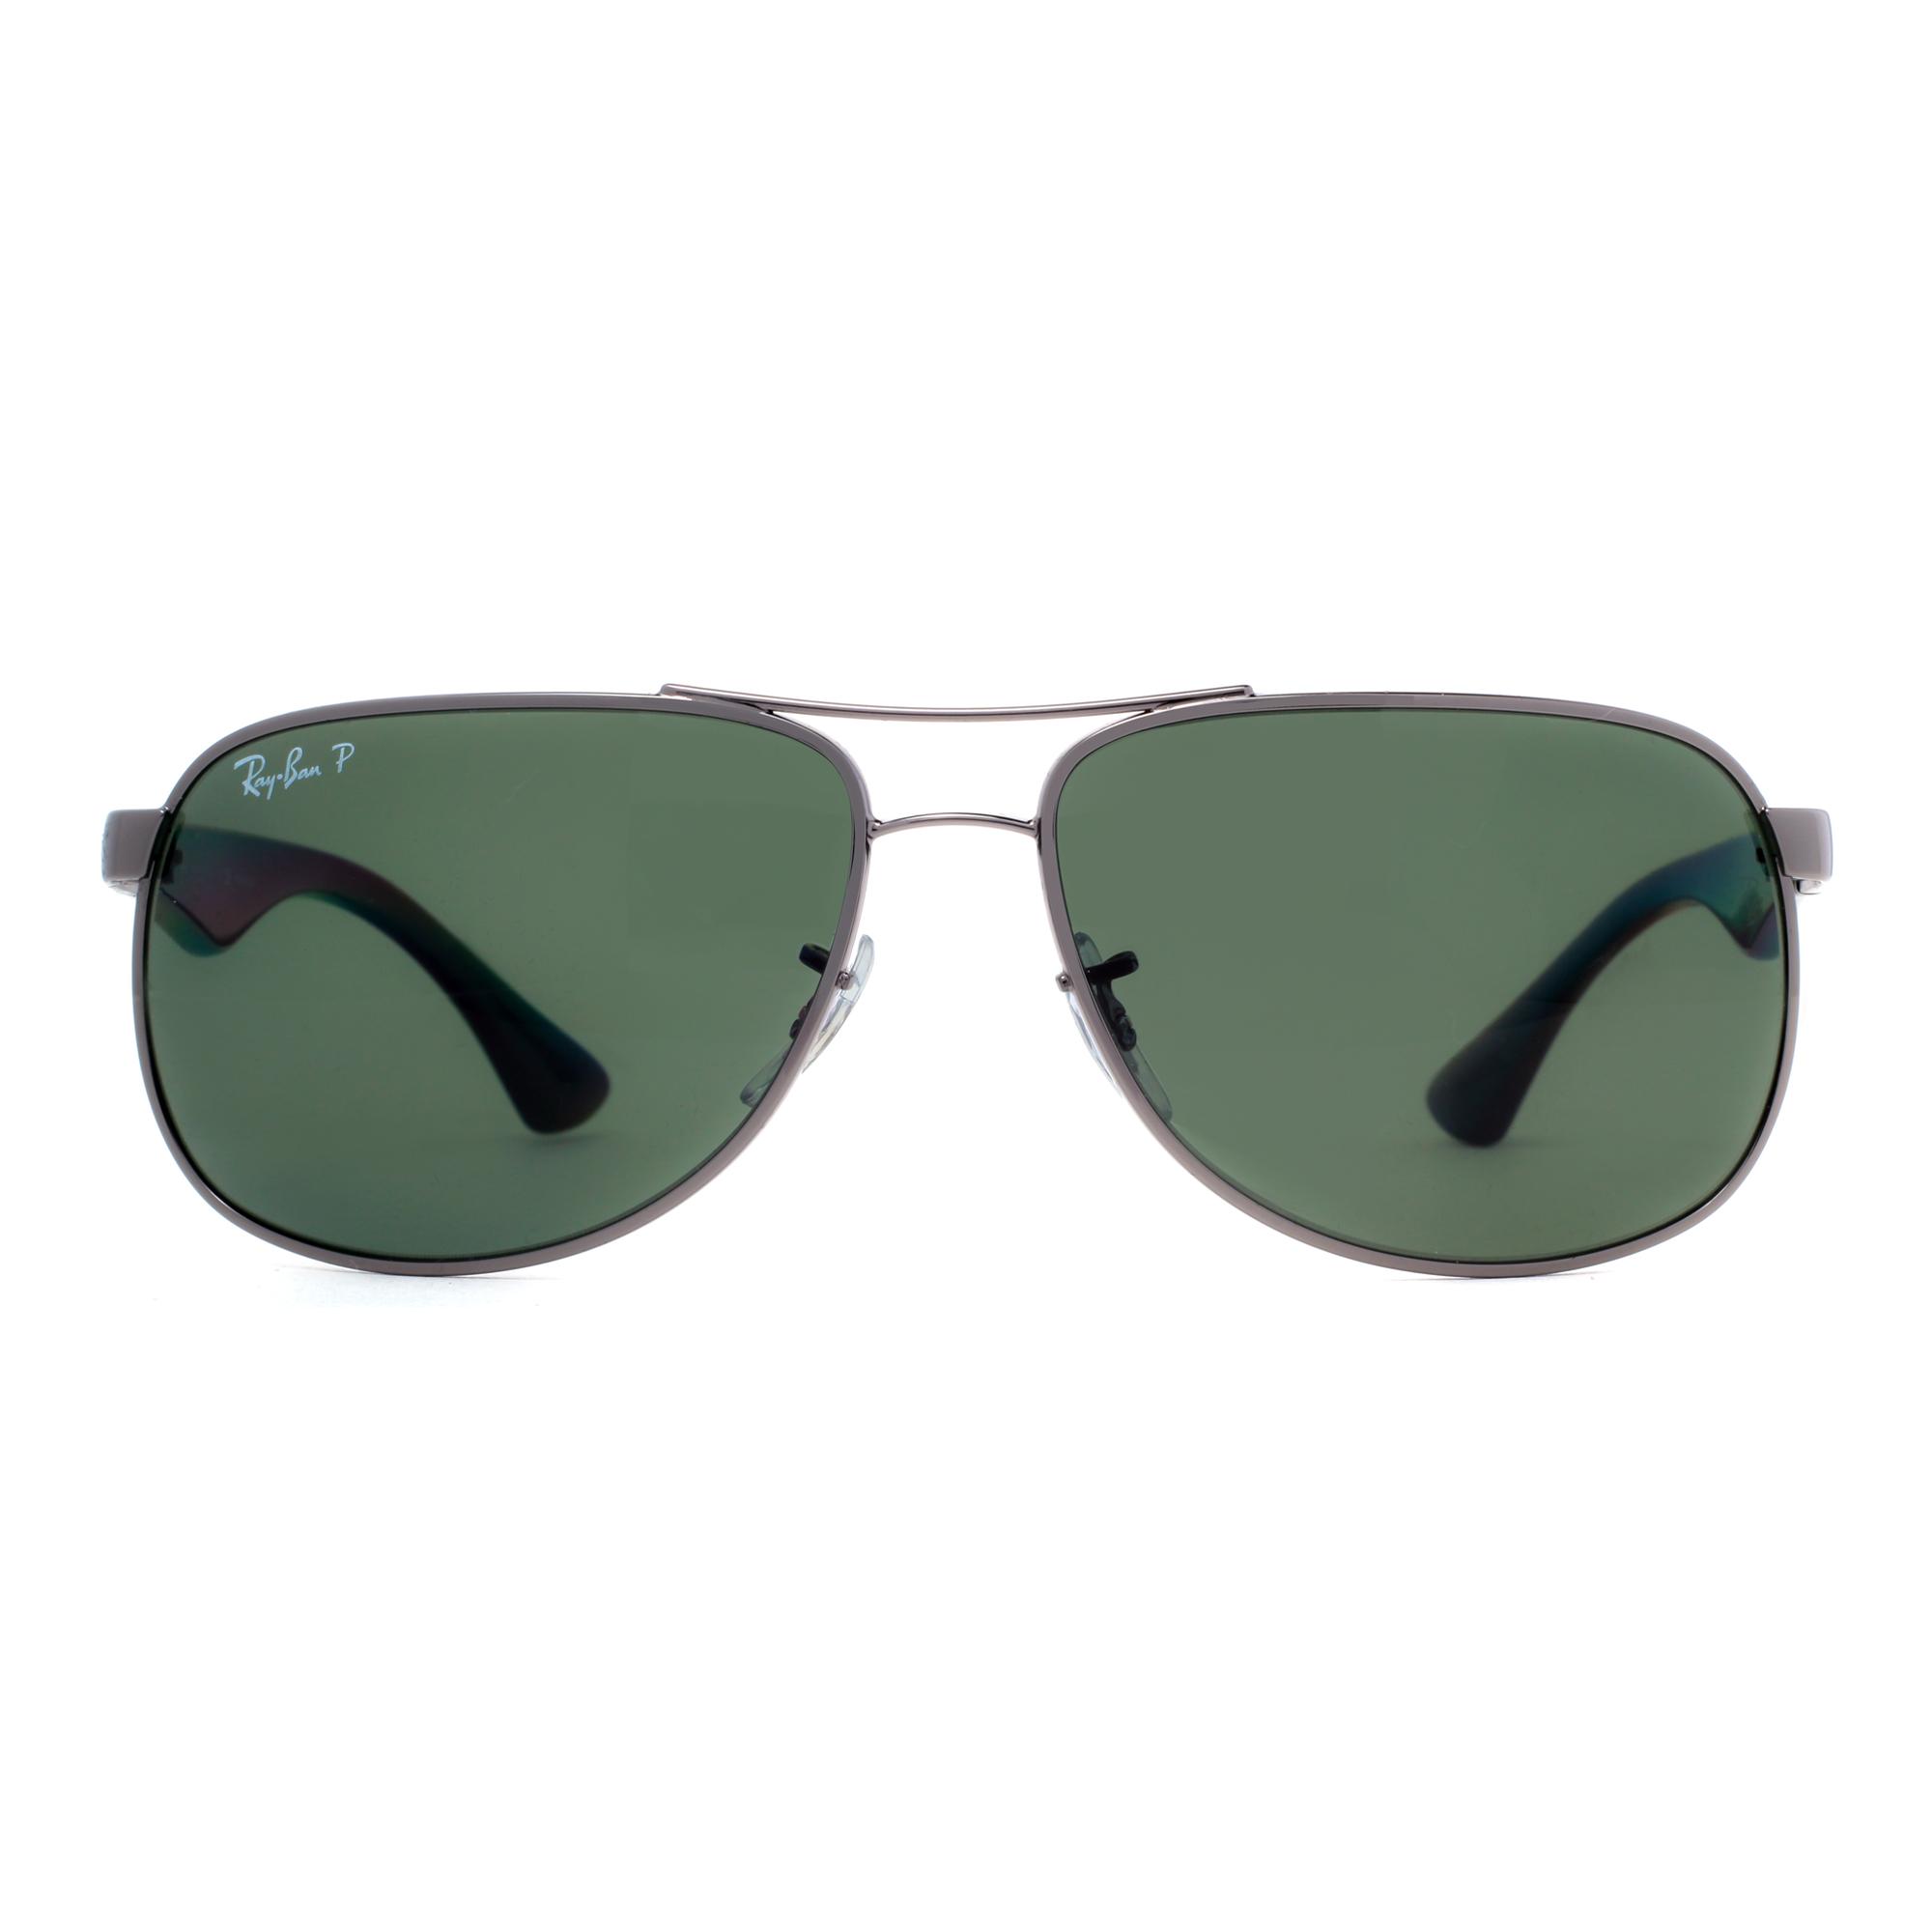 44b9cc959c2 Ray Ban Rb 3502 Sunglasses 004 « Heritage Malta